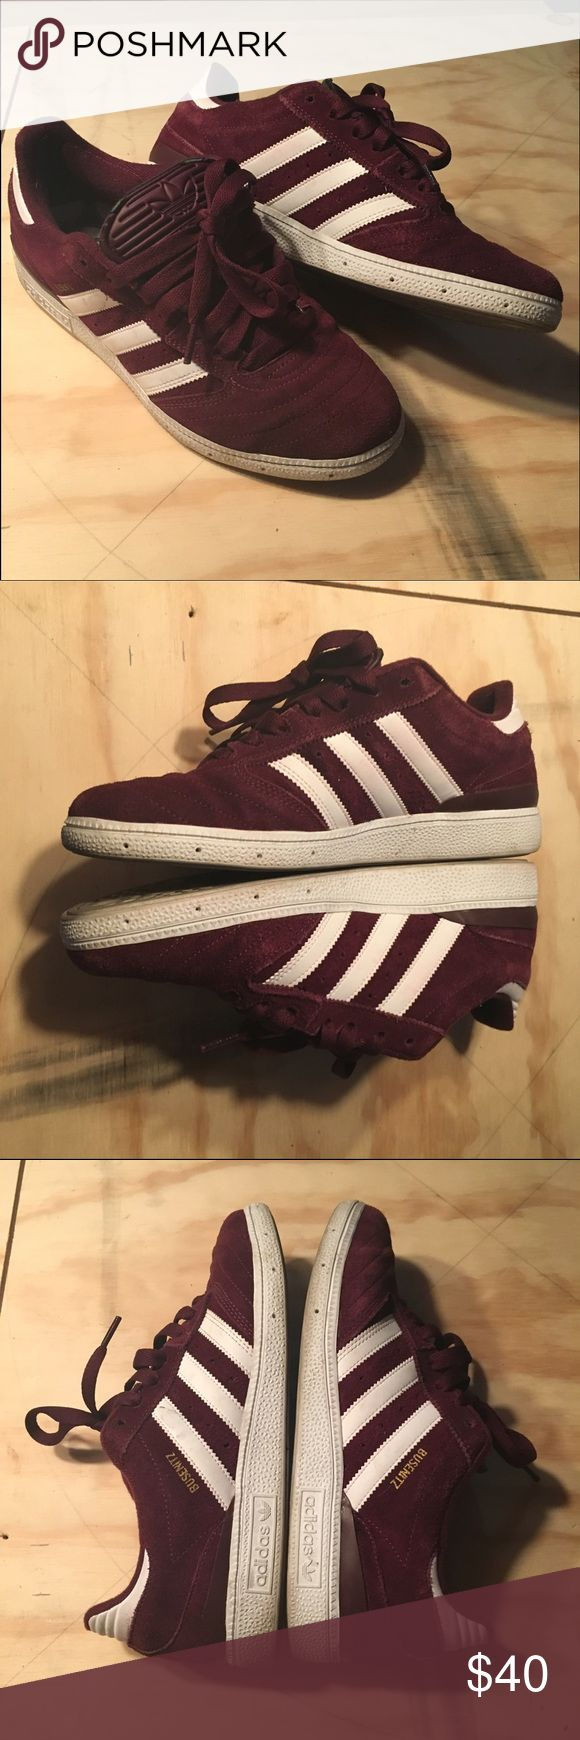 Men's Adidas Busenitz Wine/Burgundy-Gently worn (w/box & alternate laces) Adidas Shoes Sneakers